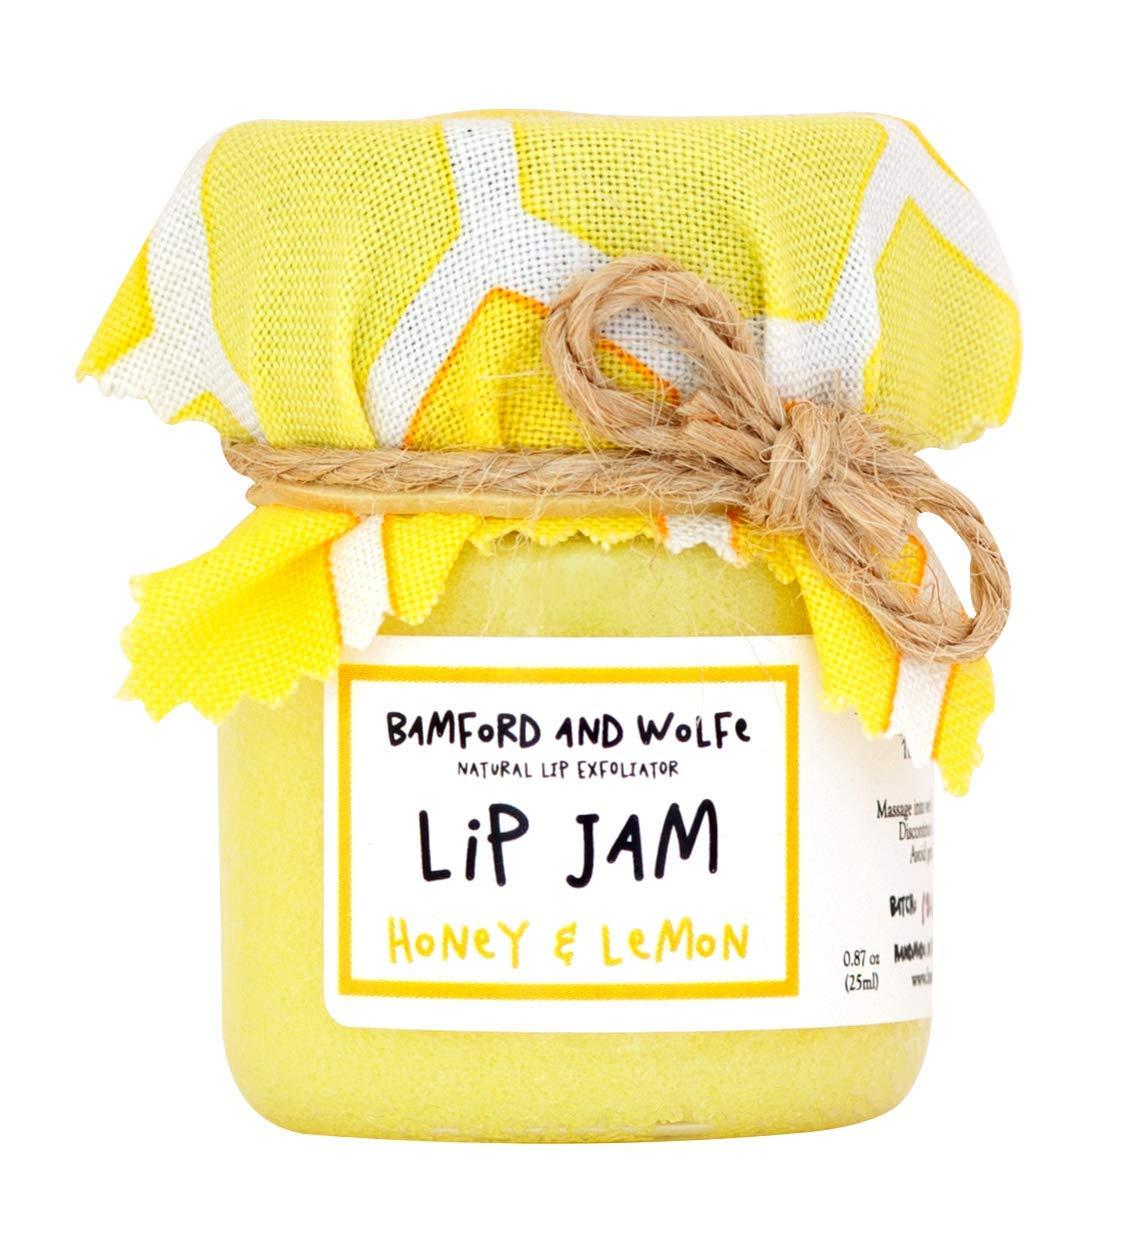 Lip Jam Honey Brand Price reduction Cheap Sale Venue Lemon – Exfoliating Natural. All Scrub